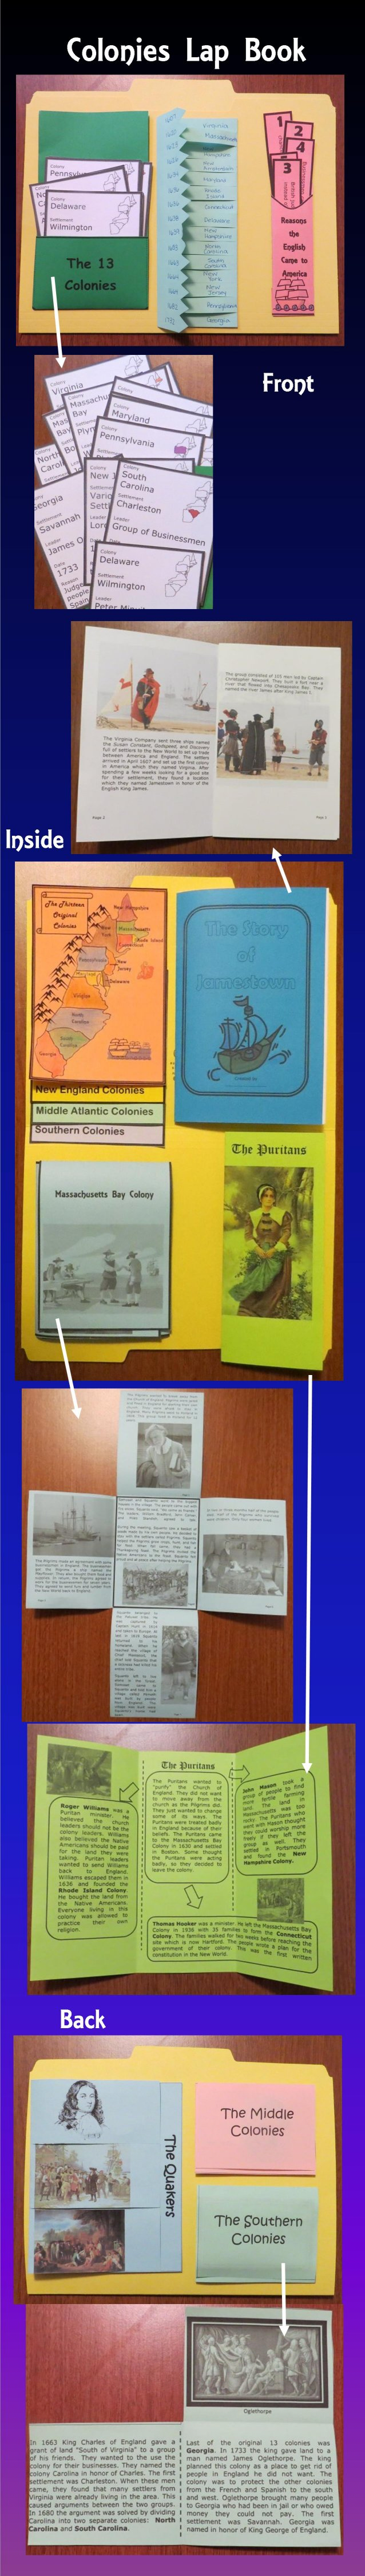 Colonial America Lap Book